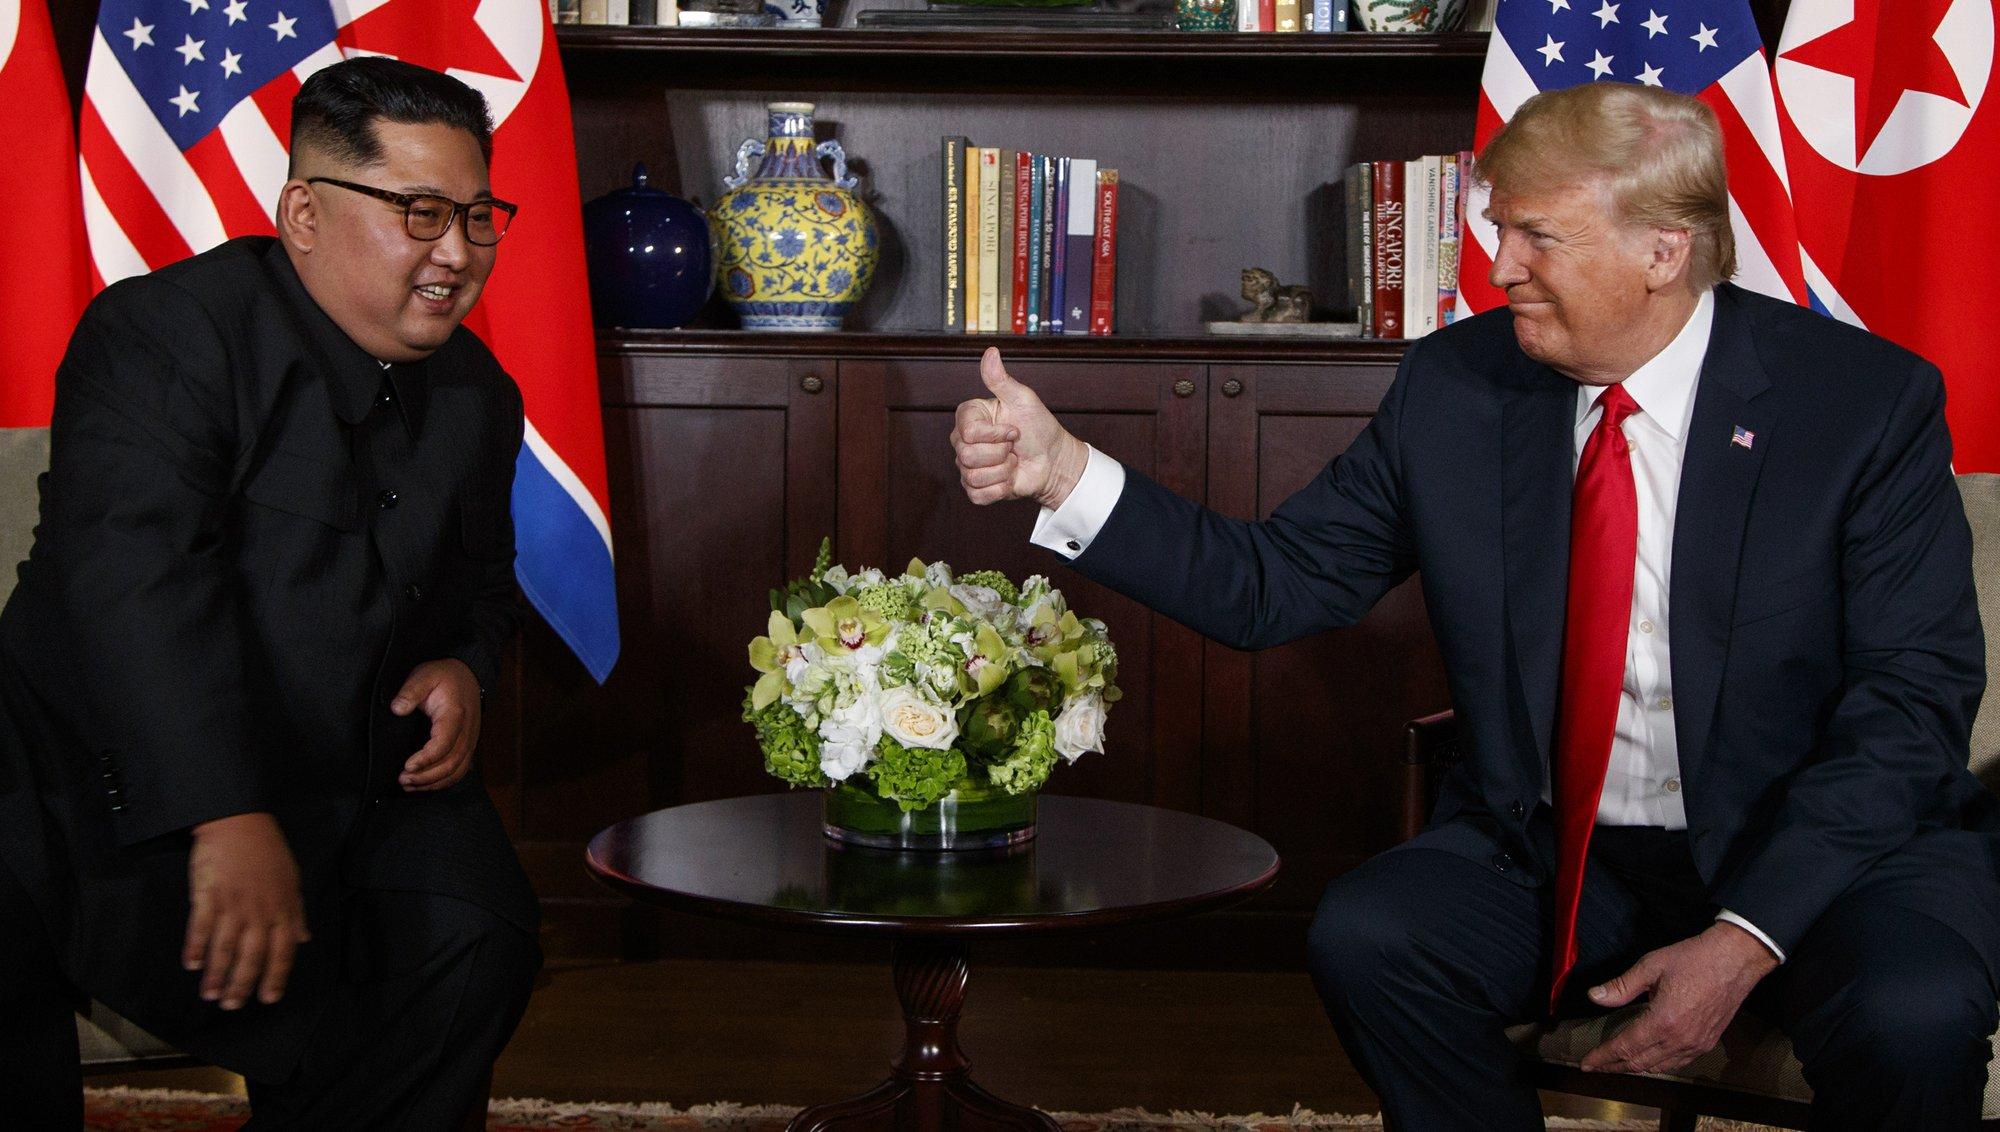 AP Explains: What everyone wants at the Trump-Kim summit